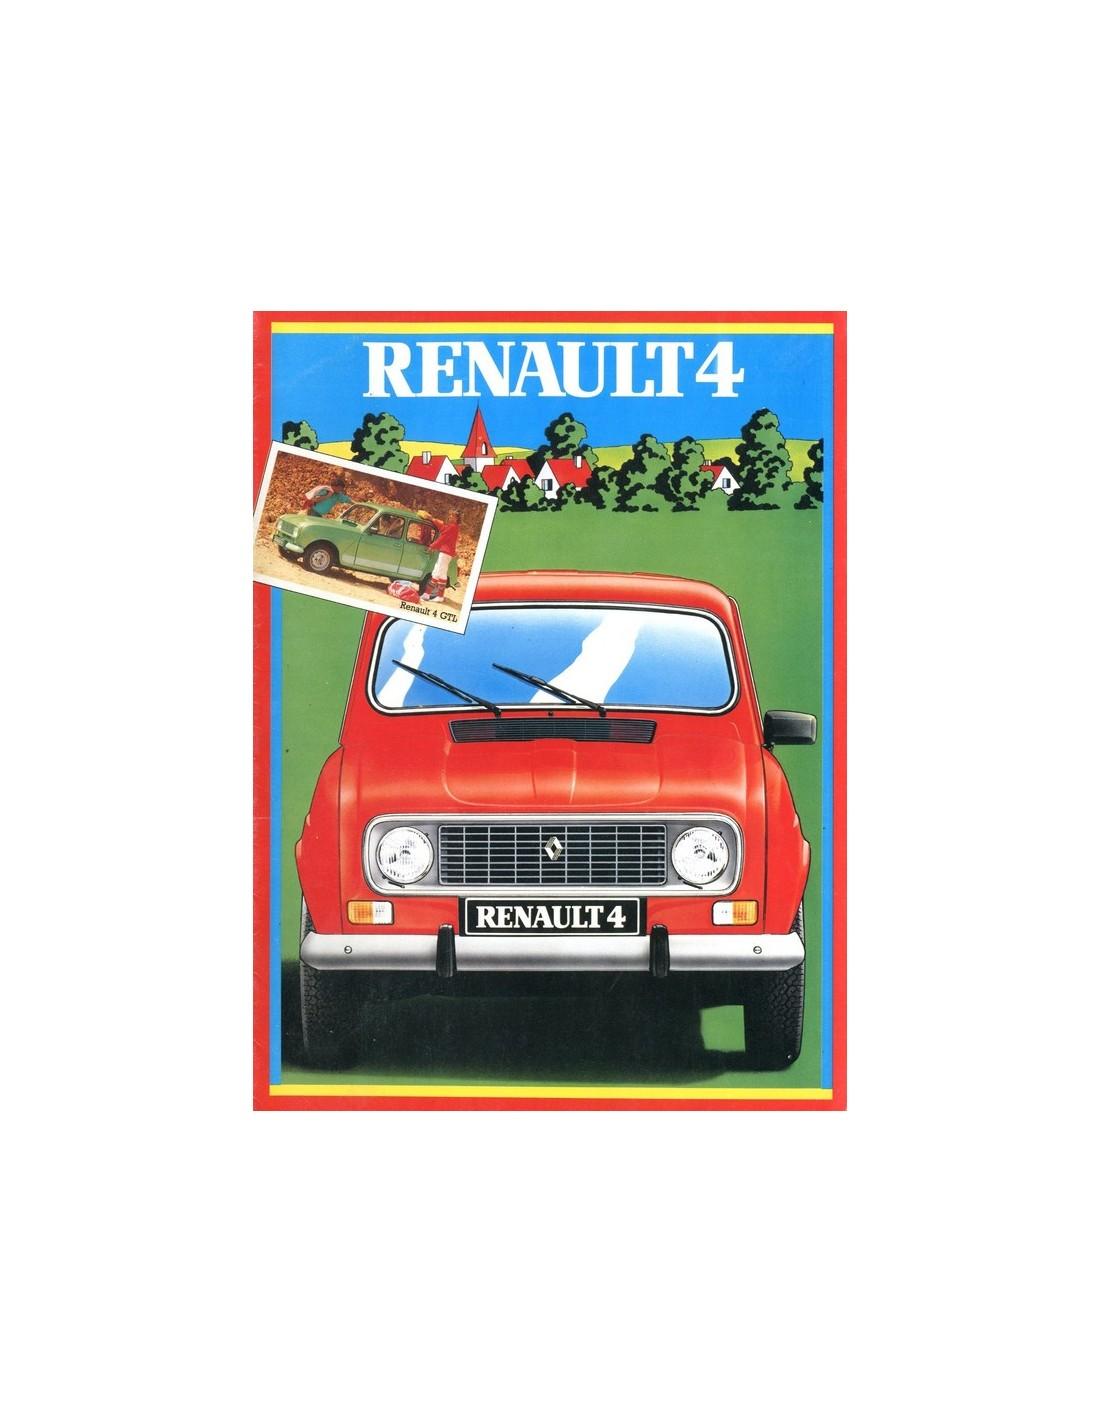 Bmw Z3 Brochure: 1983 RENAULT 4 BROCHURE GERMAN